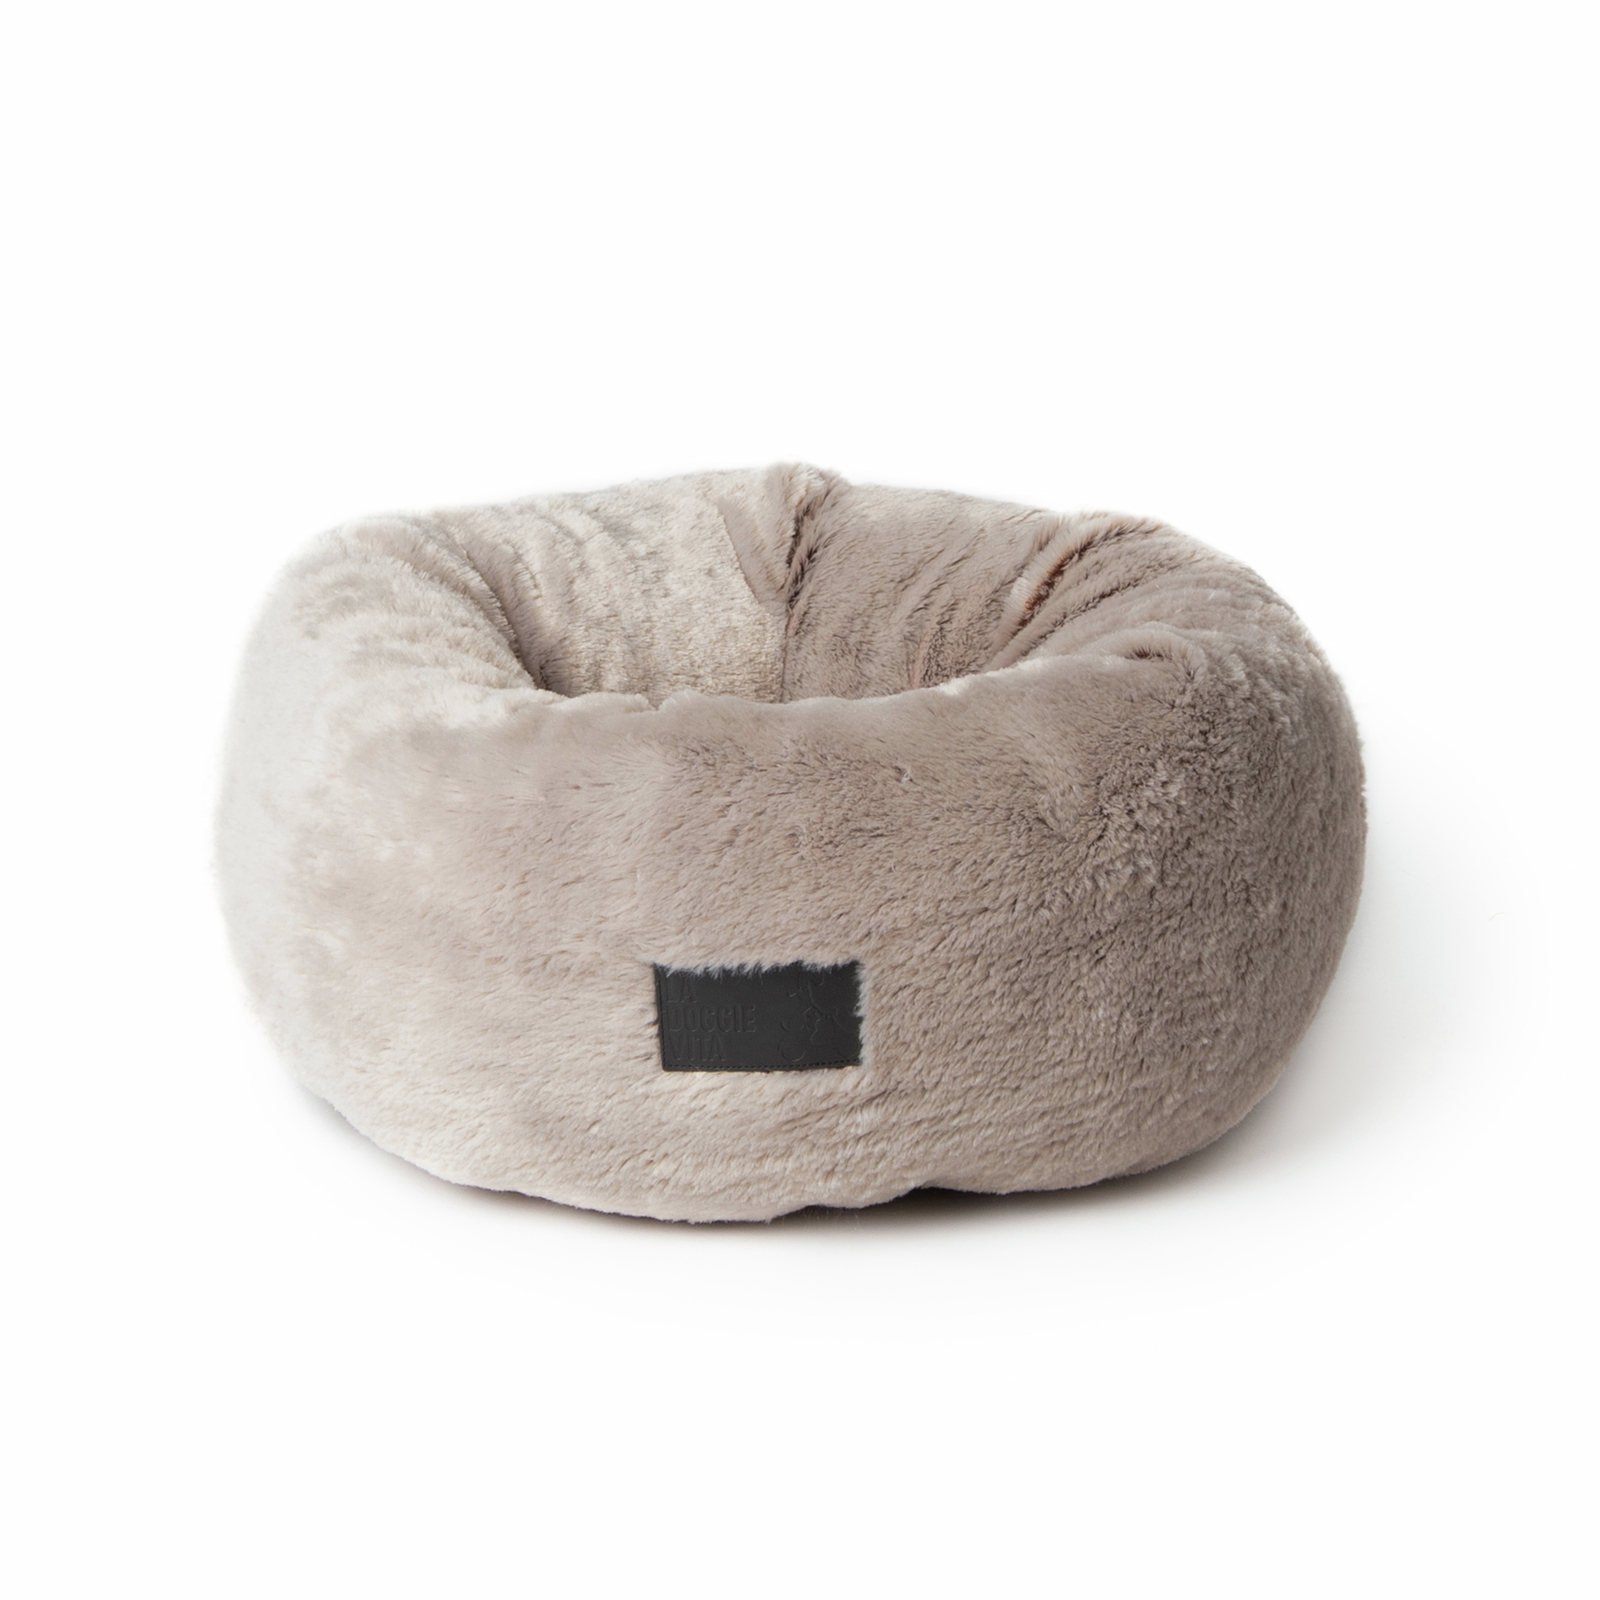 La Doggie Vita Two Tone Taupe Plush Dog Donut Bed